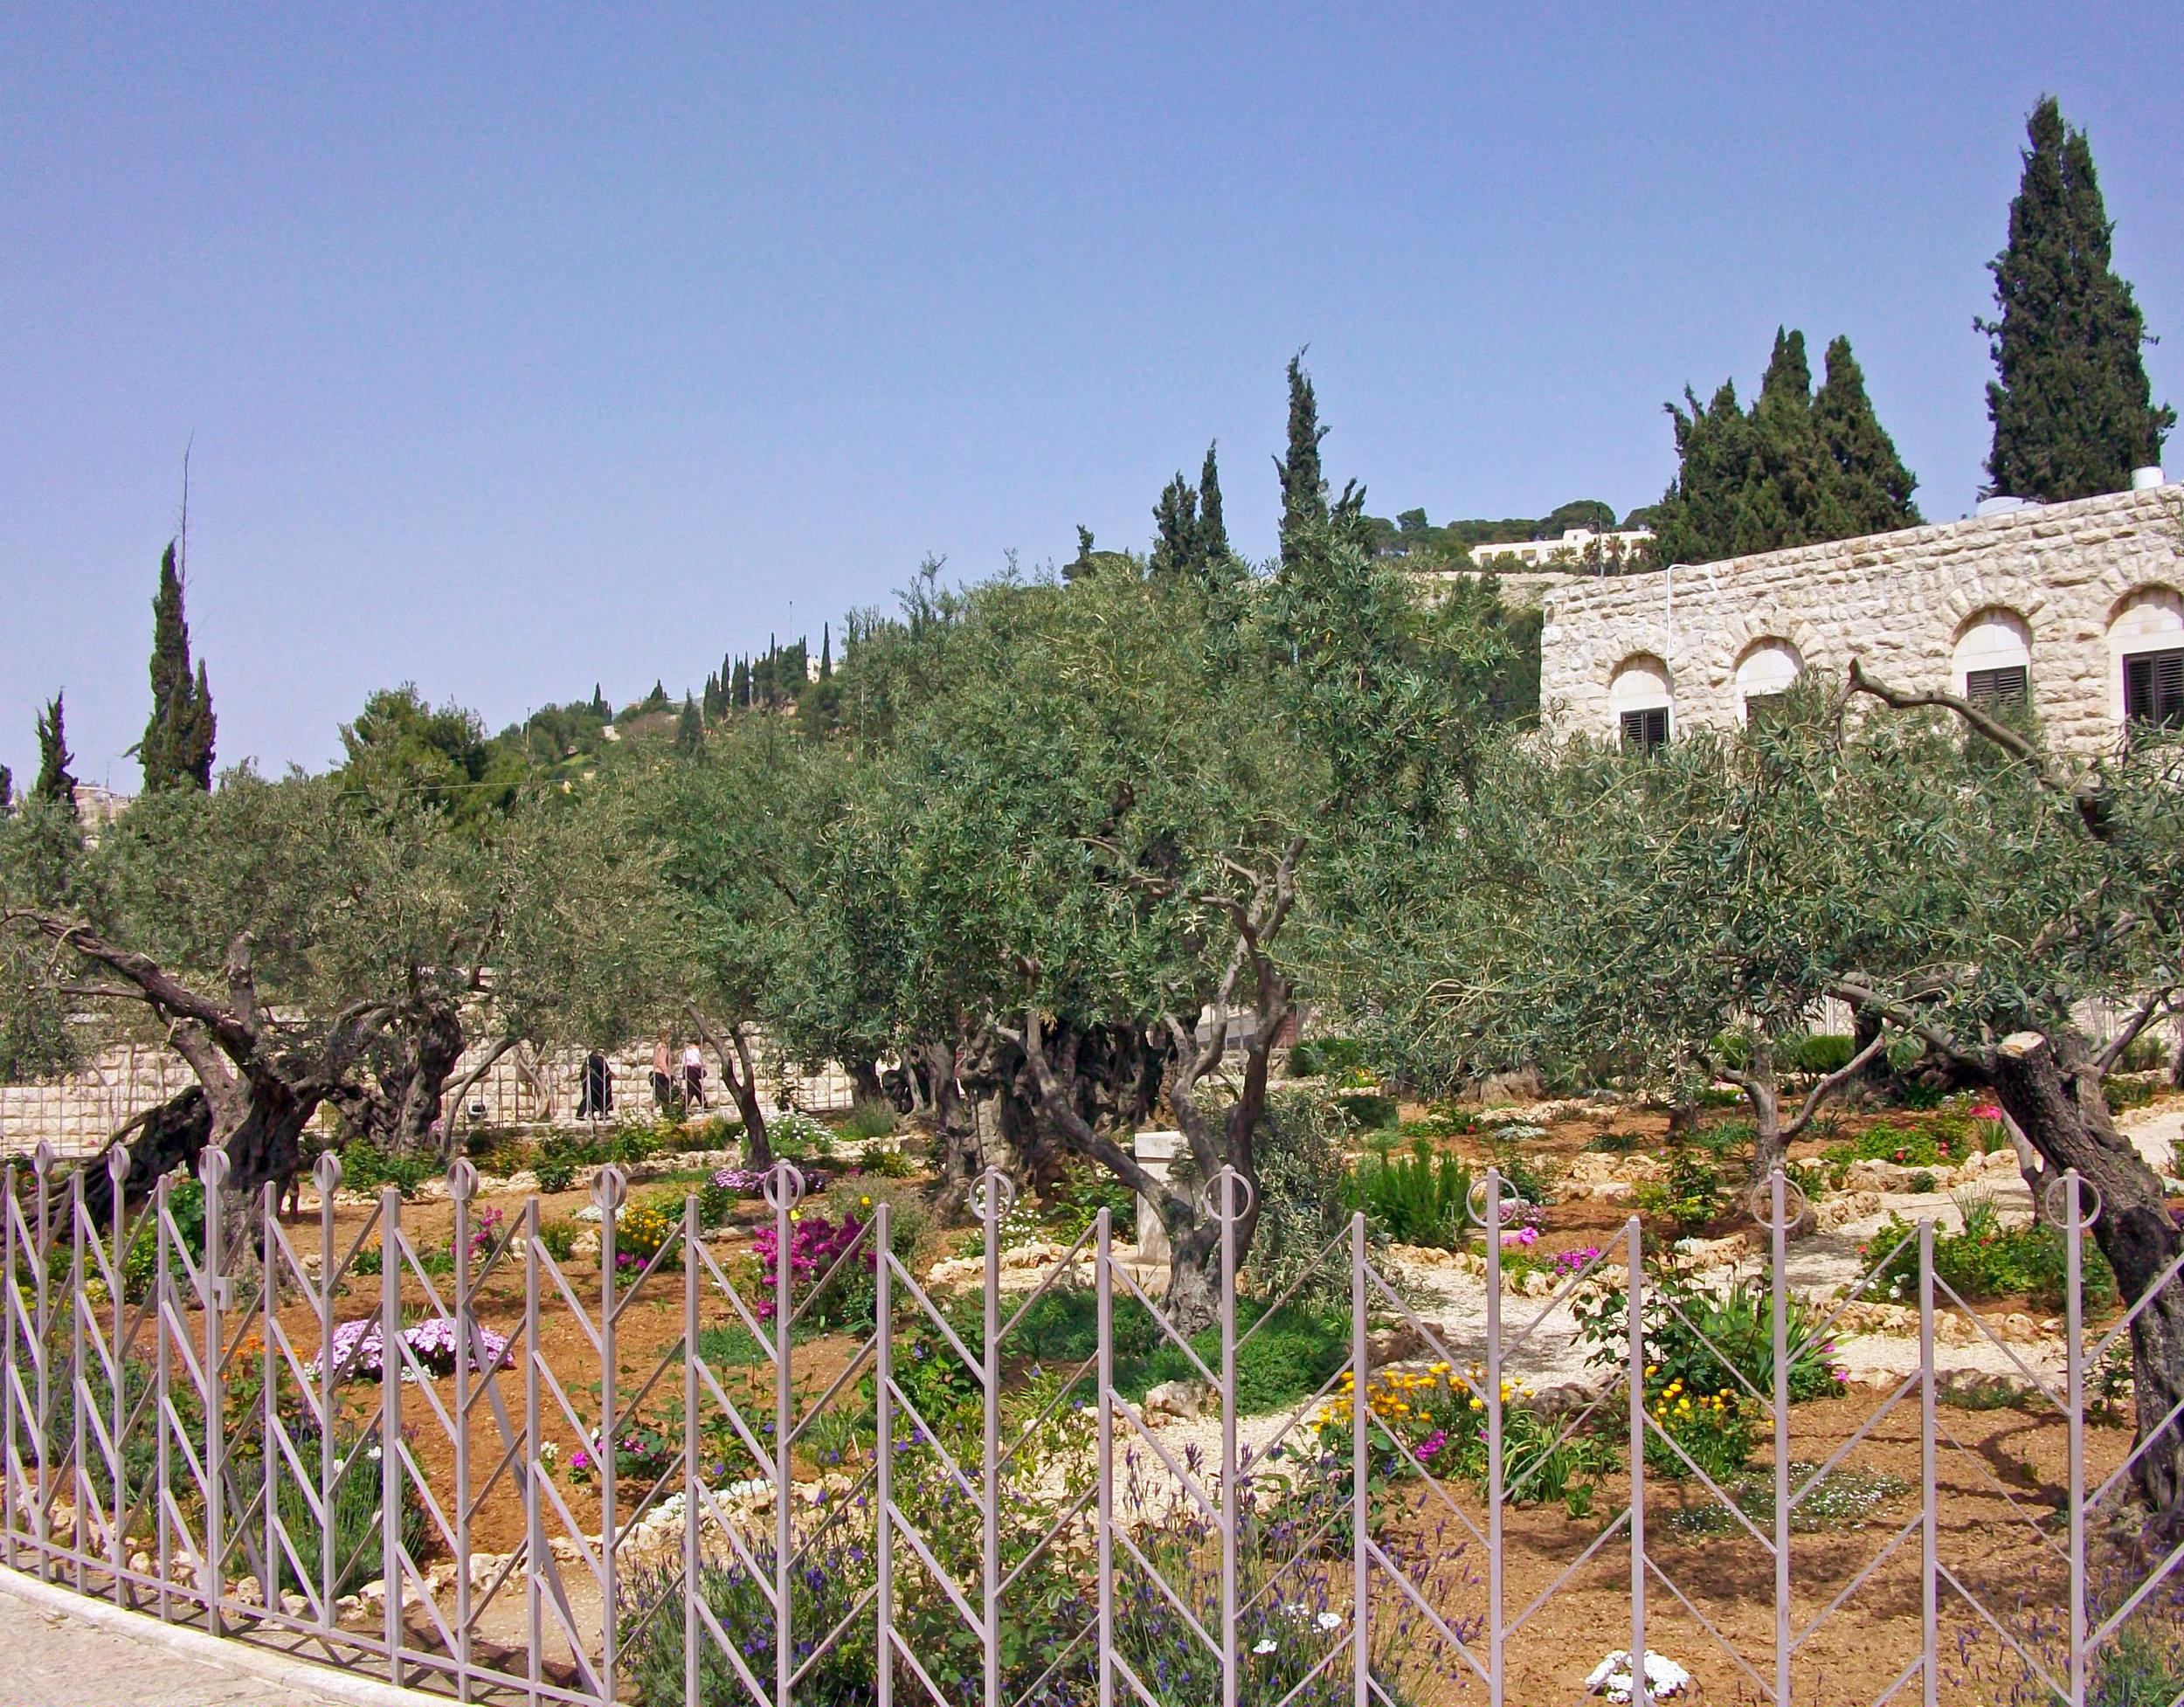 Garden_of_Gethsemane_holy_land_tours.jpg